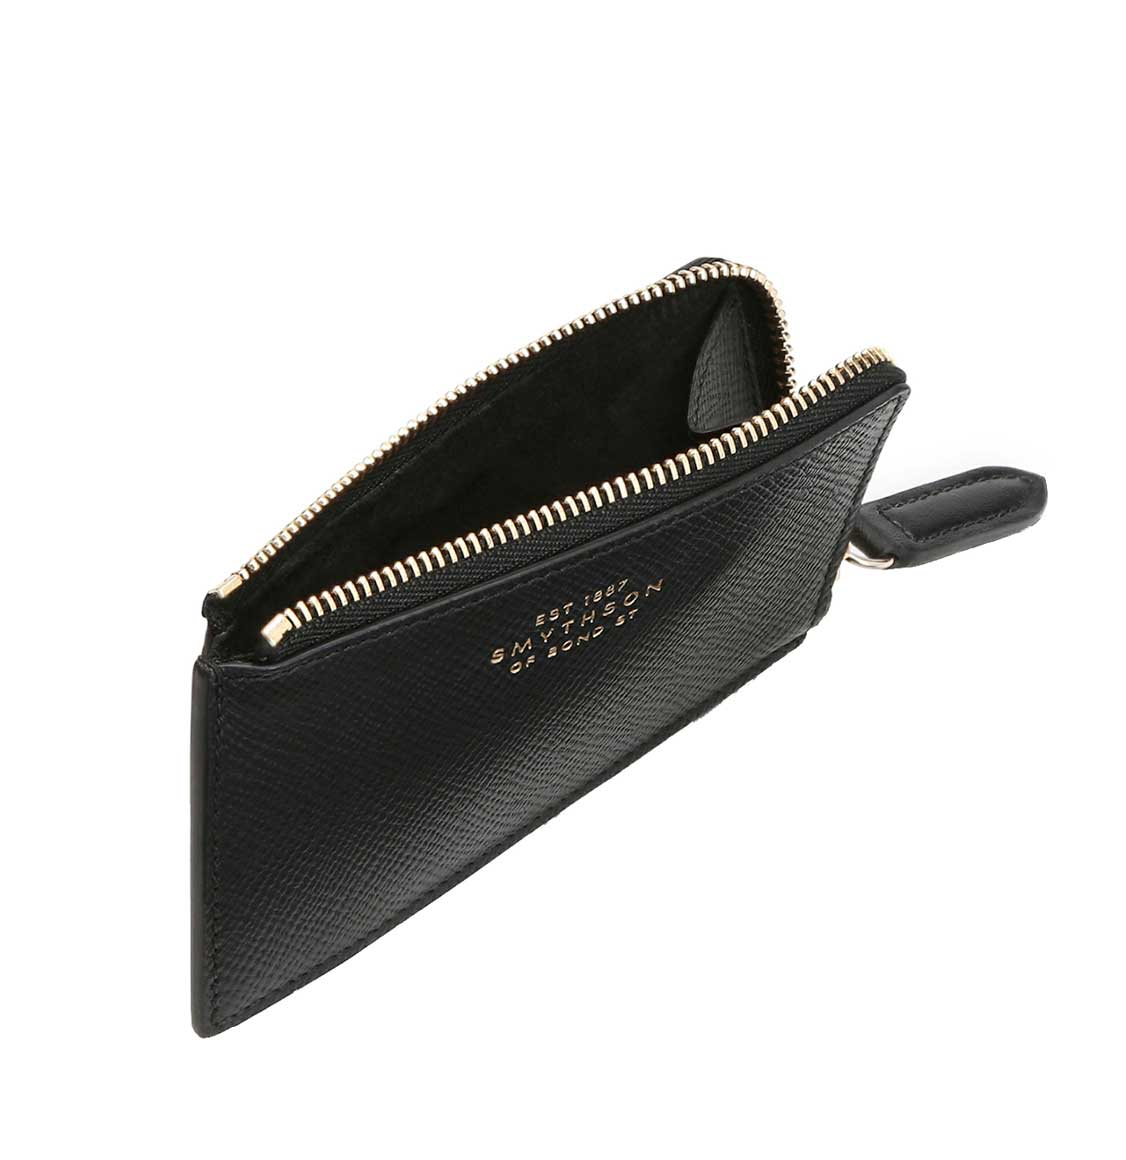 Smythson Panama Cross-Grain Leather Cardholder Coin Purse Black